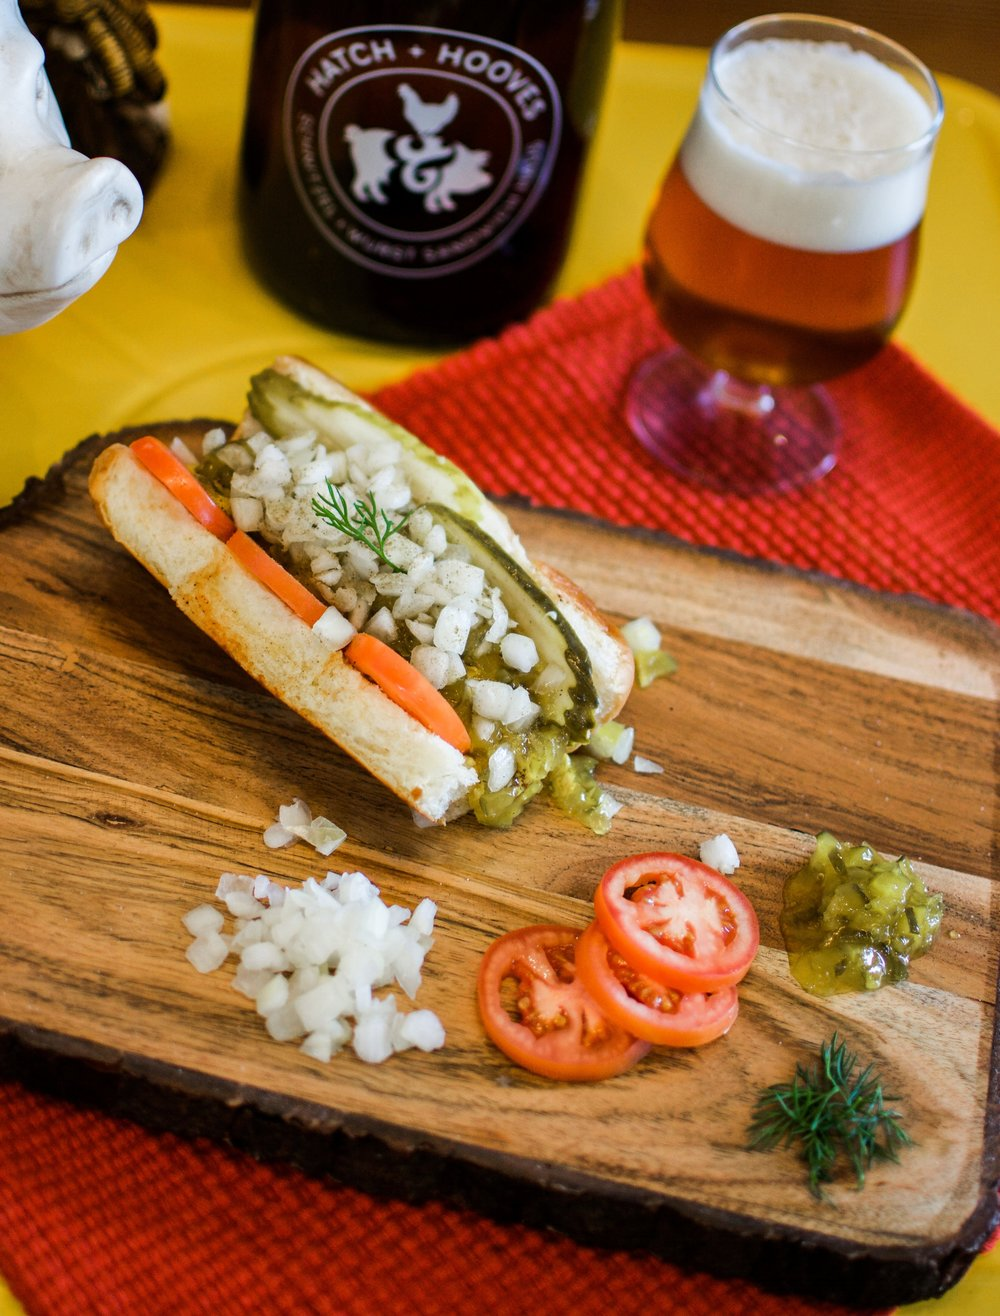 HAUS WURST SANDWICHES - Sandwiches served on Kings Hawaiian Rolls.